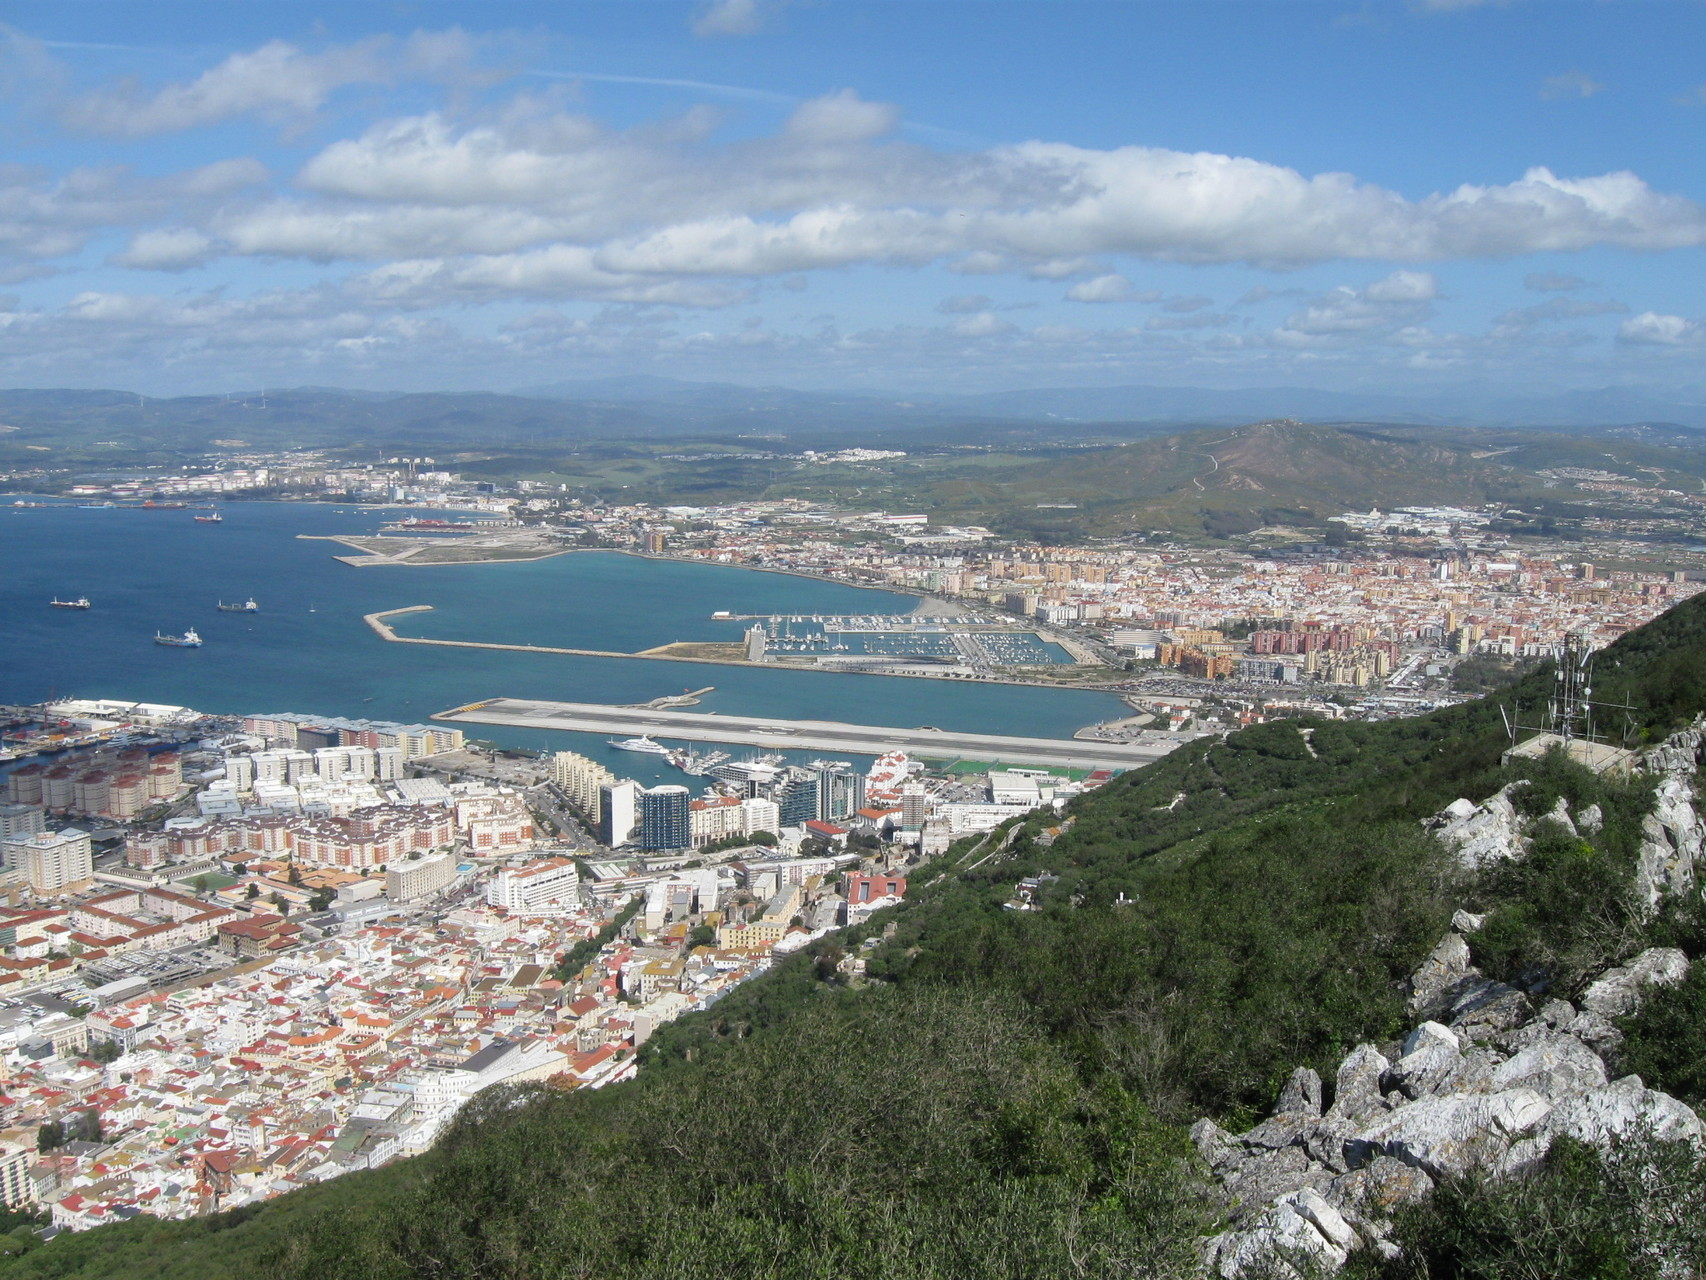 La Alcaidesa Marina, dort steht das WoMo